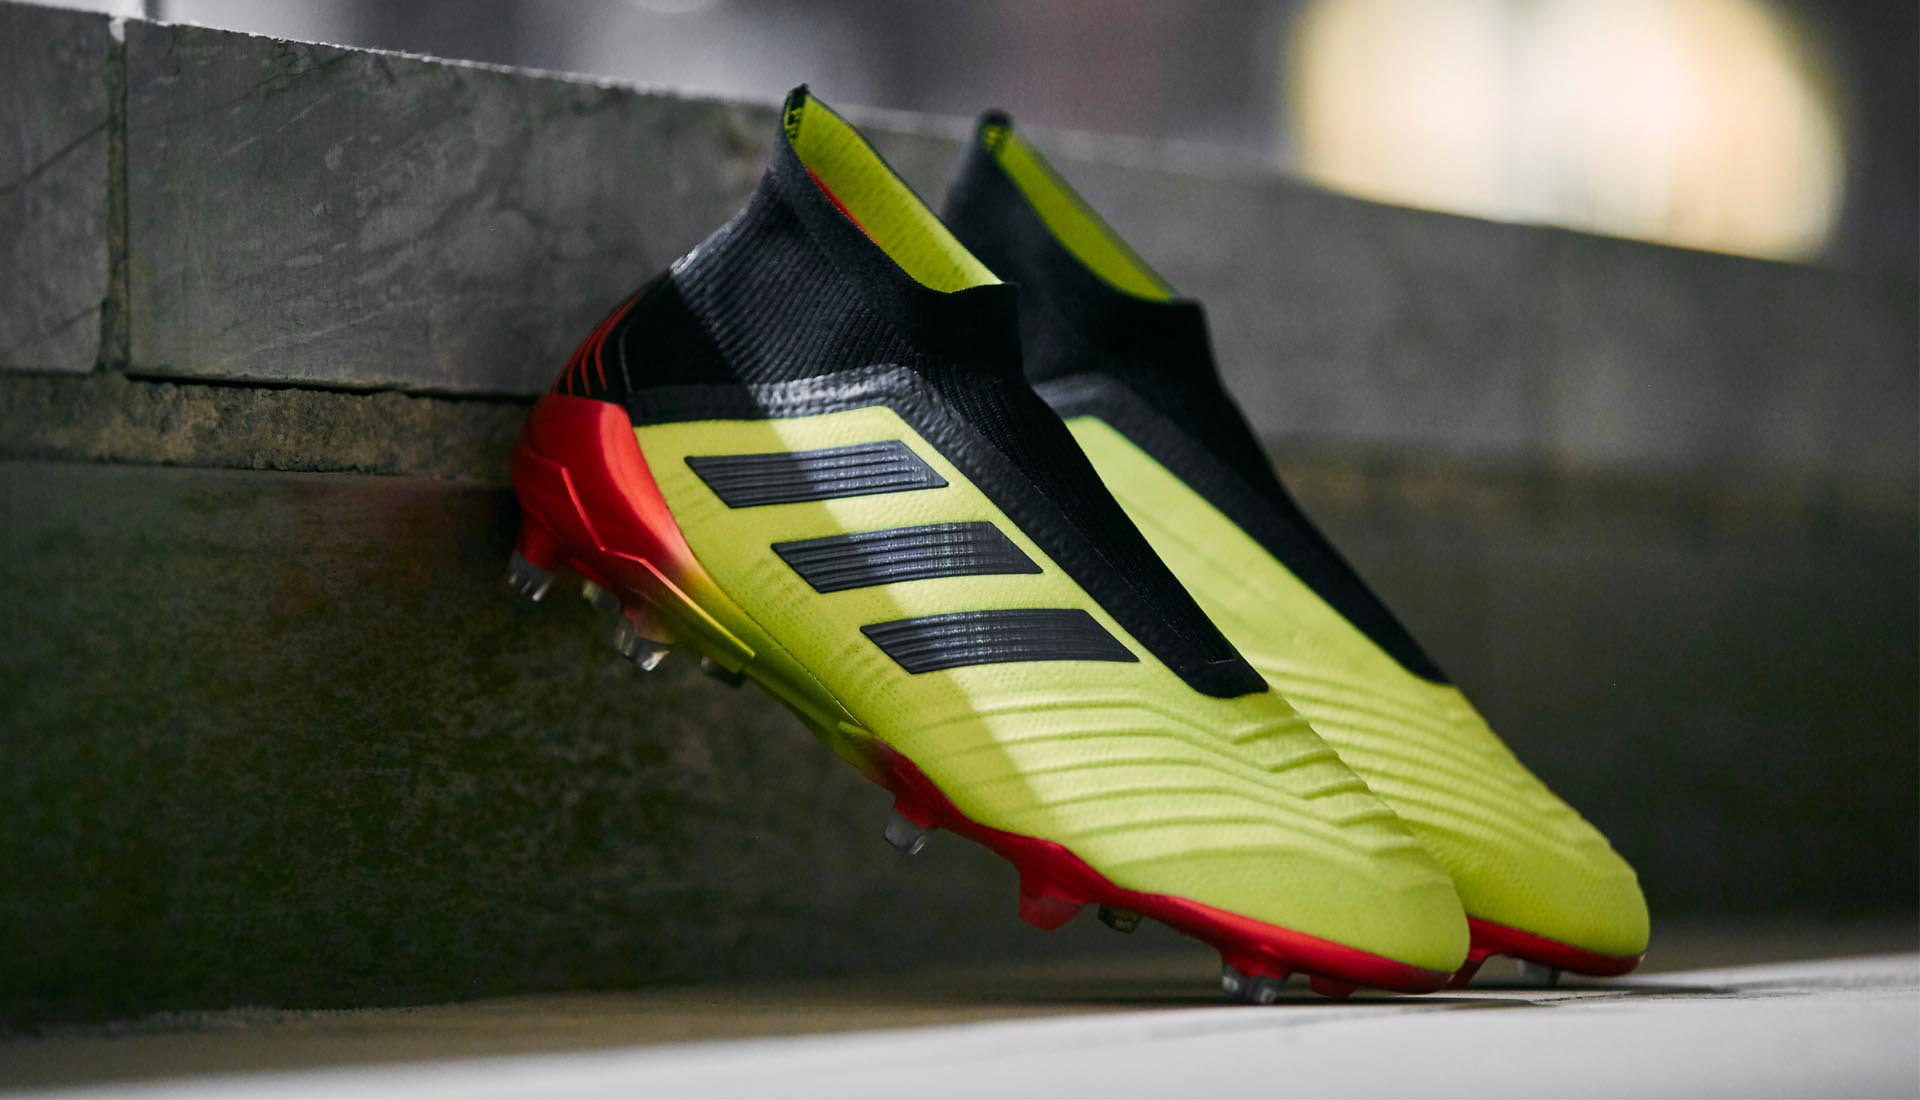 brand new a6c6c b1a71 10-adidas-predator-energy-mode-world-cup.jpg